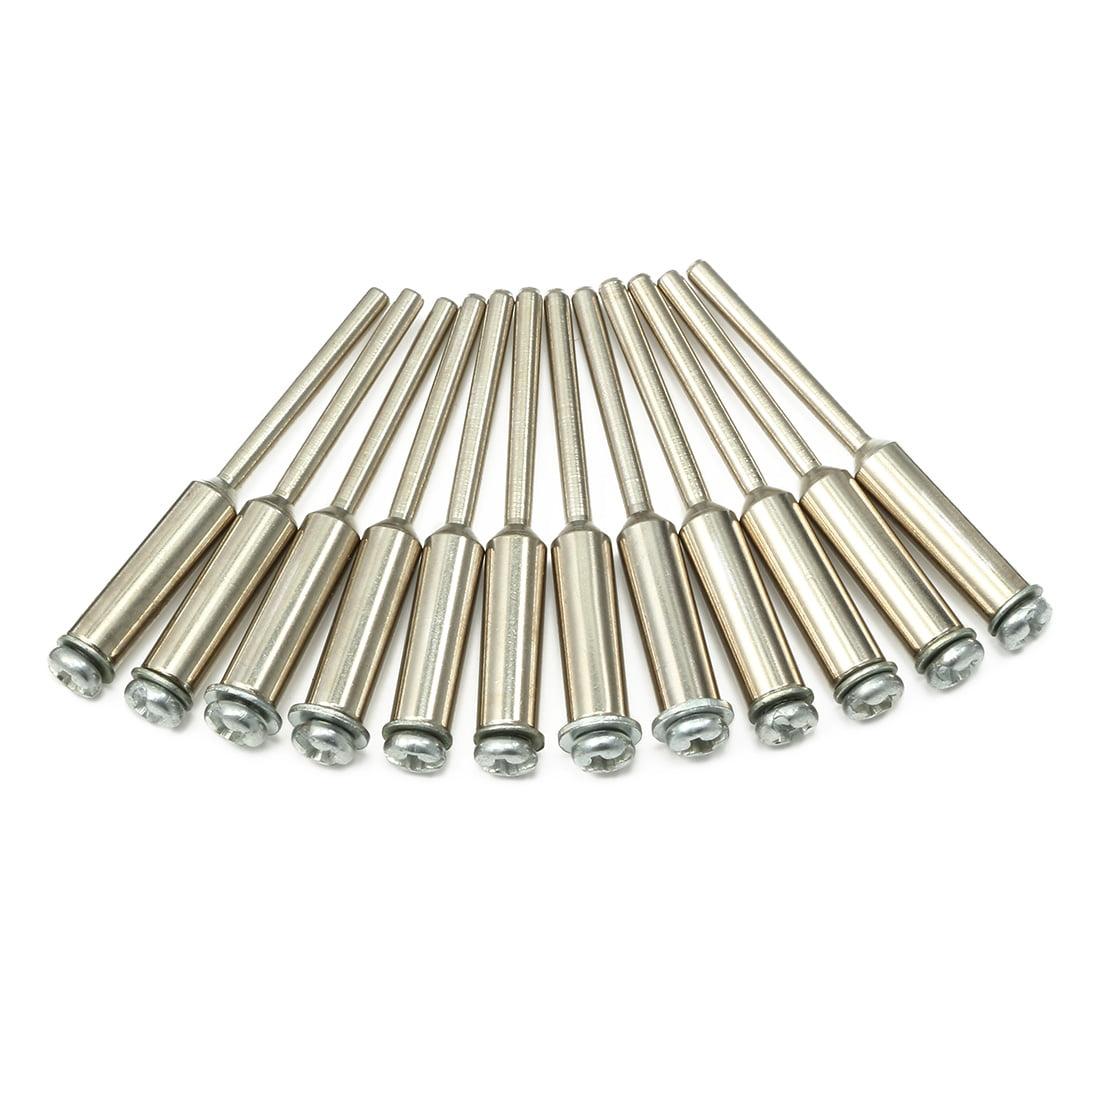 3mm Dia Diamond Cutting Wheel Mandrel Arbour Shaft 12pcs